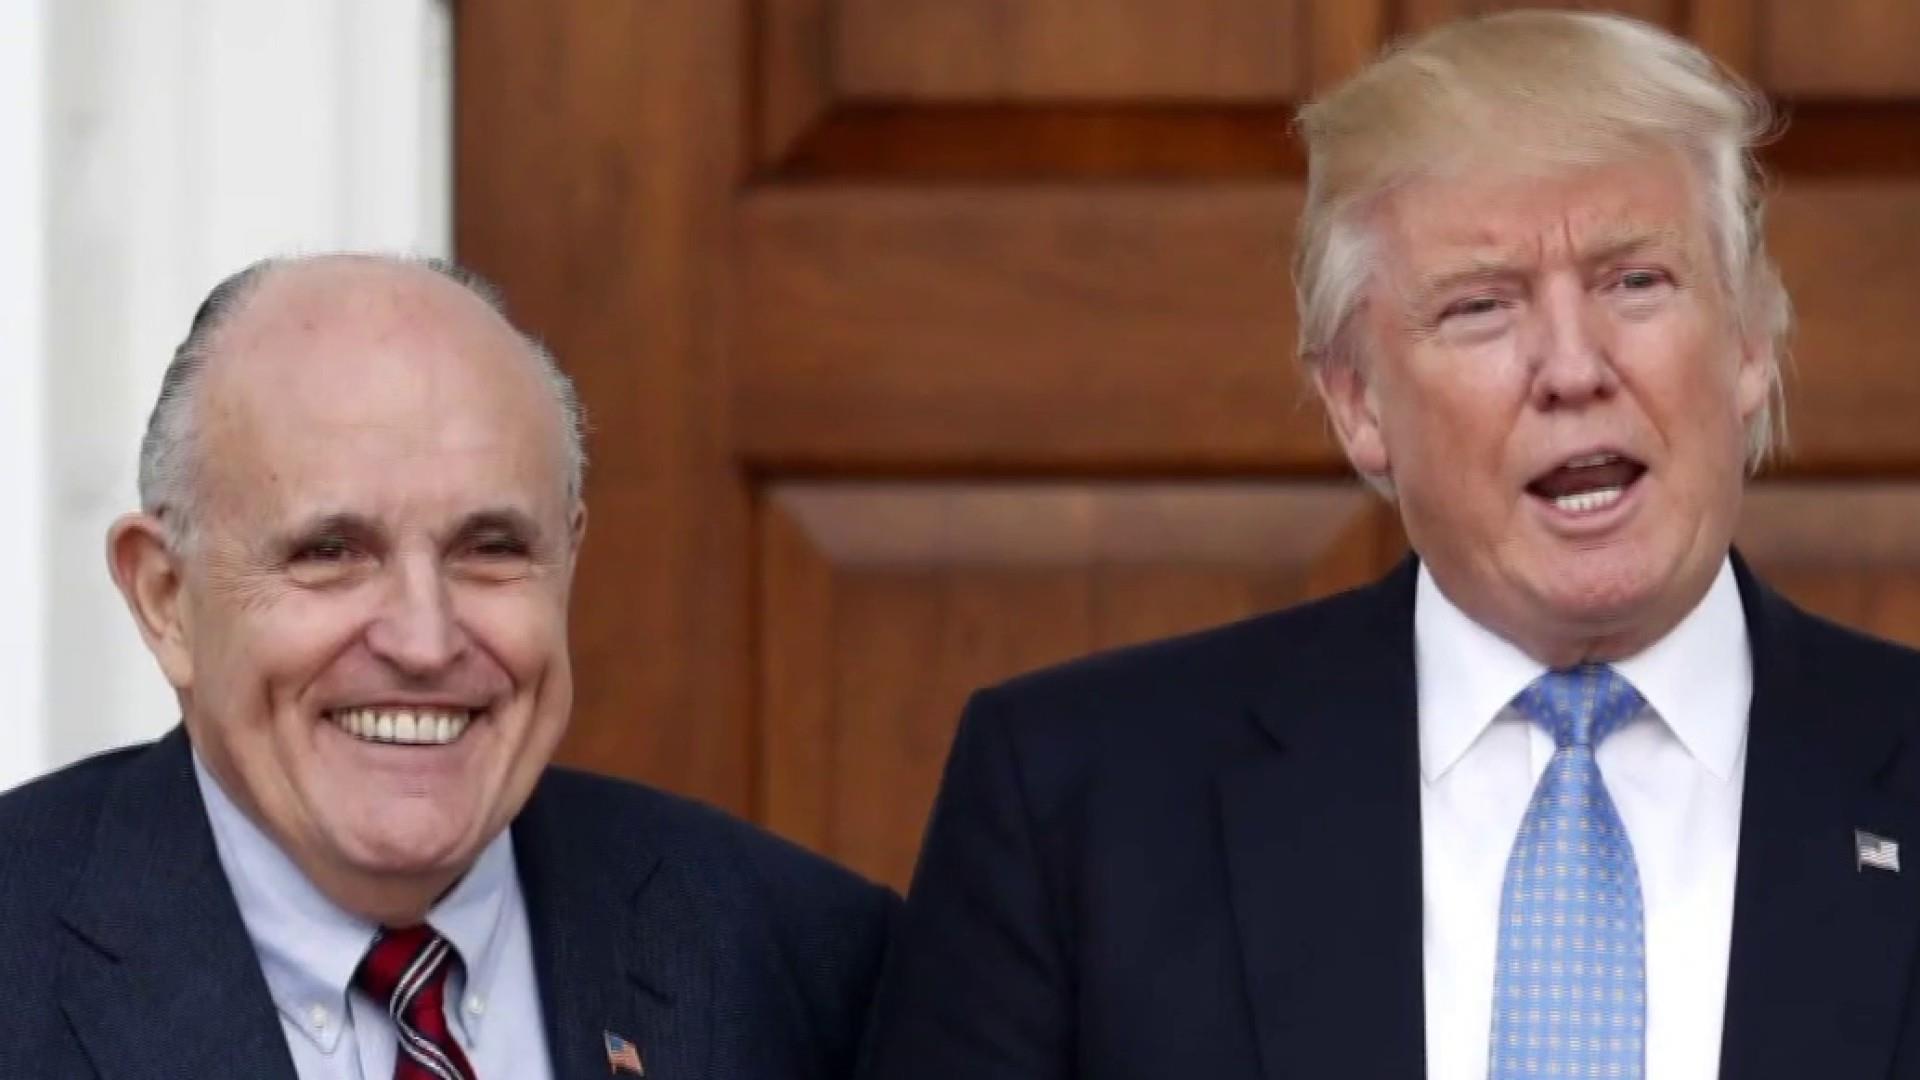 Frank Figliuzzi: Rudy Giuliani just threw Trump under the bus